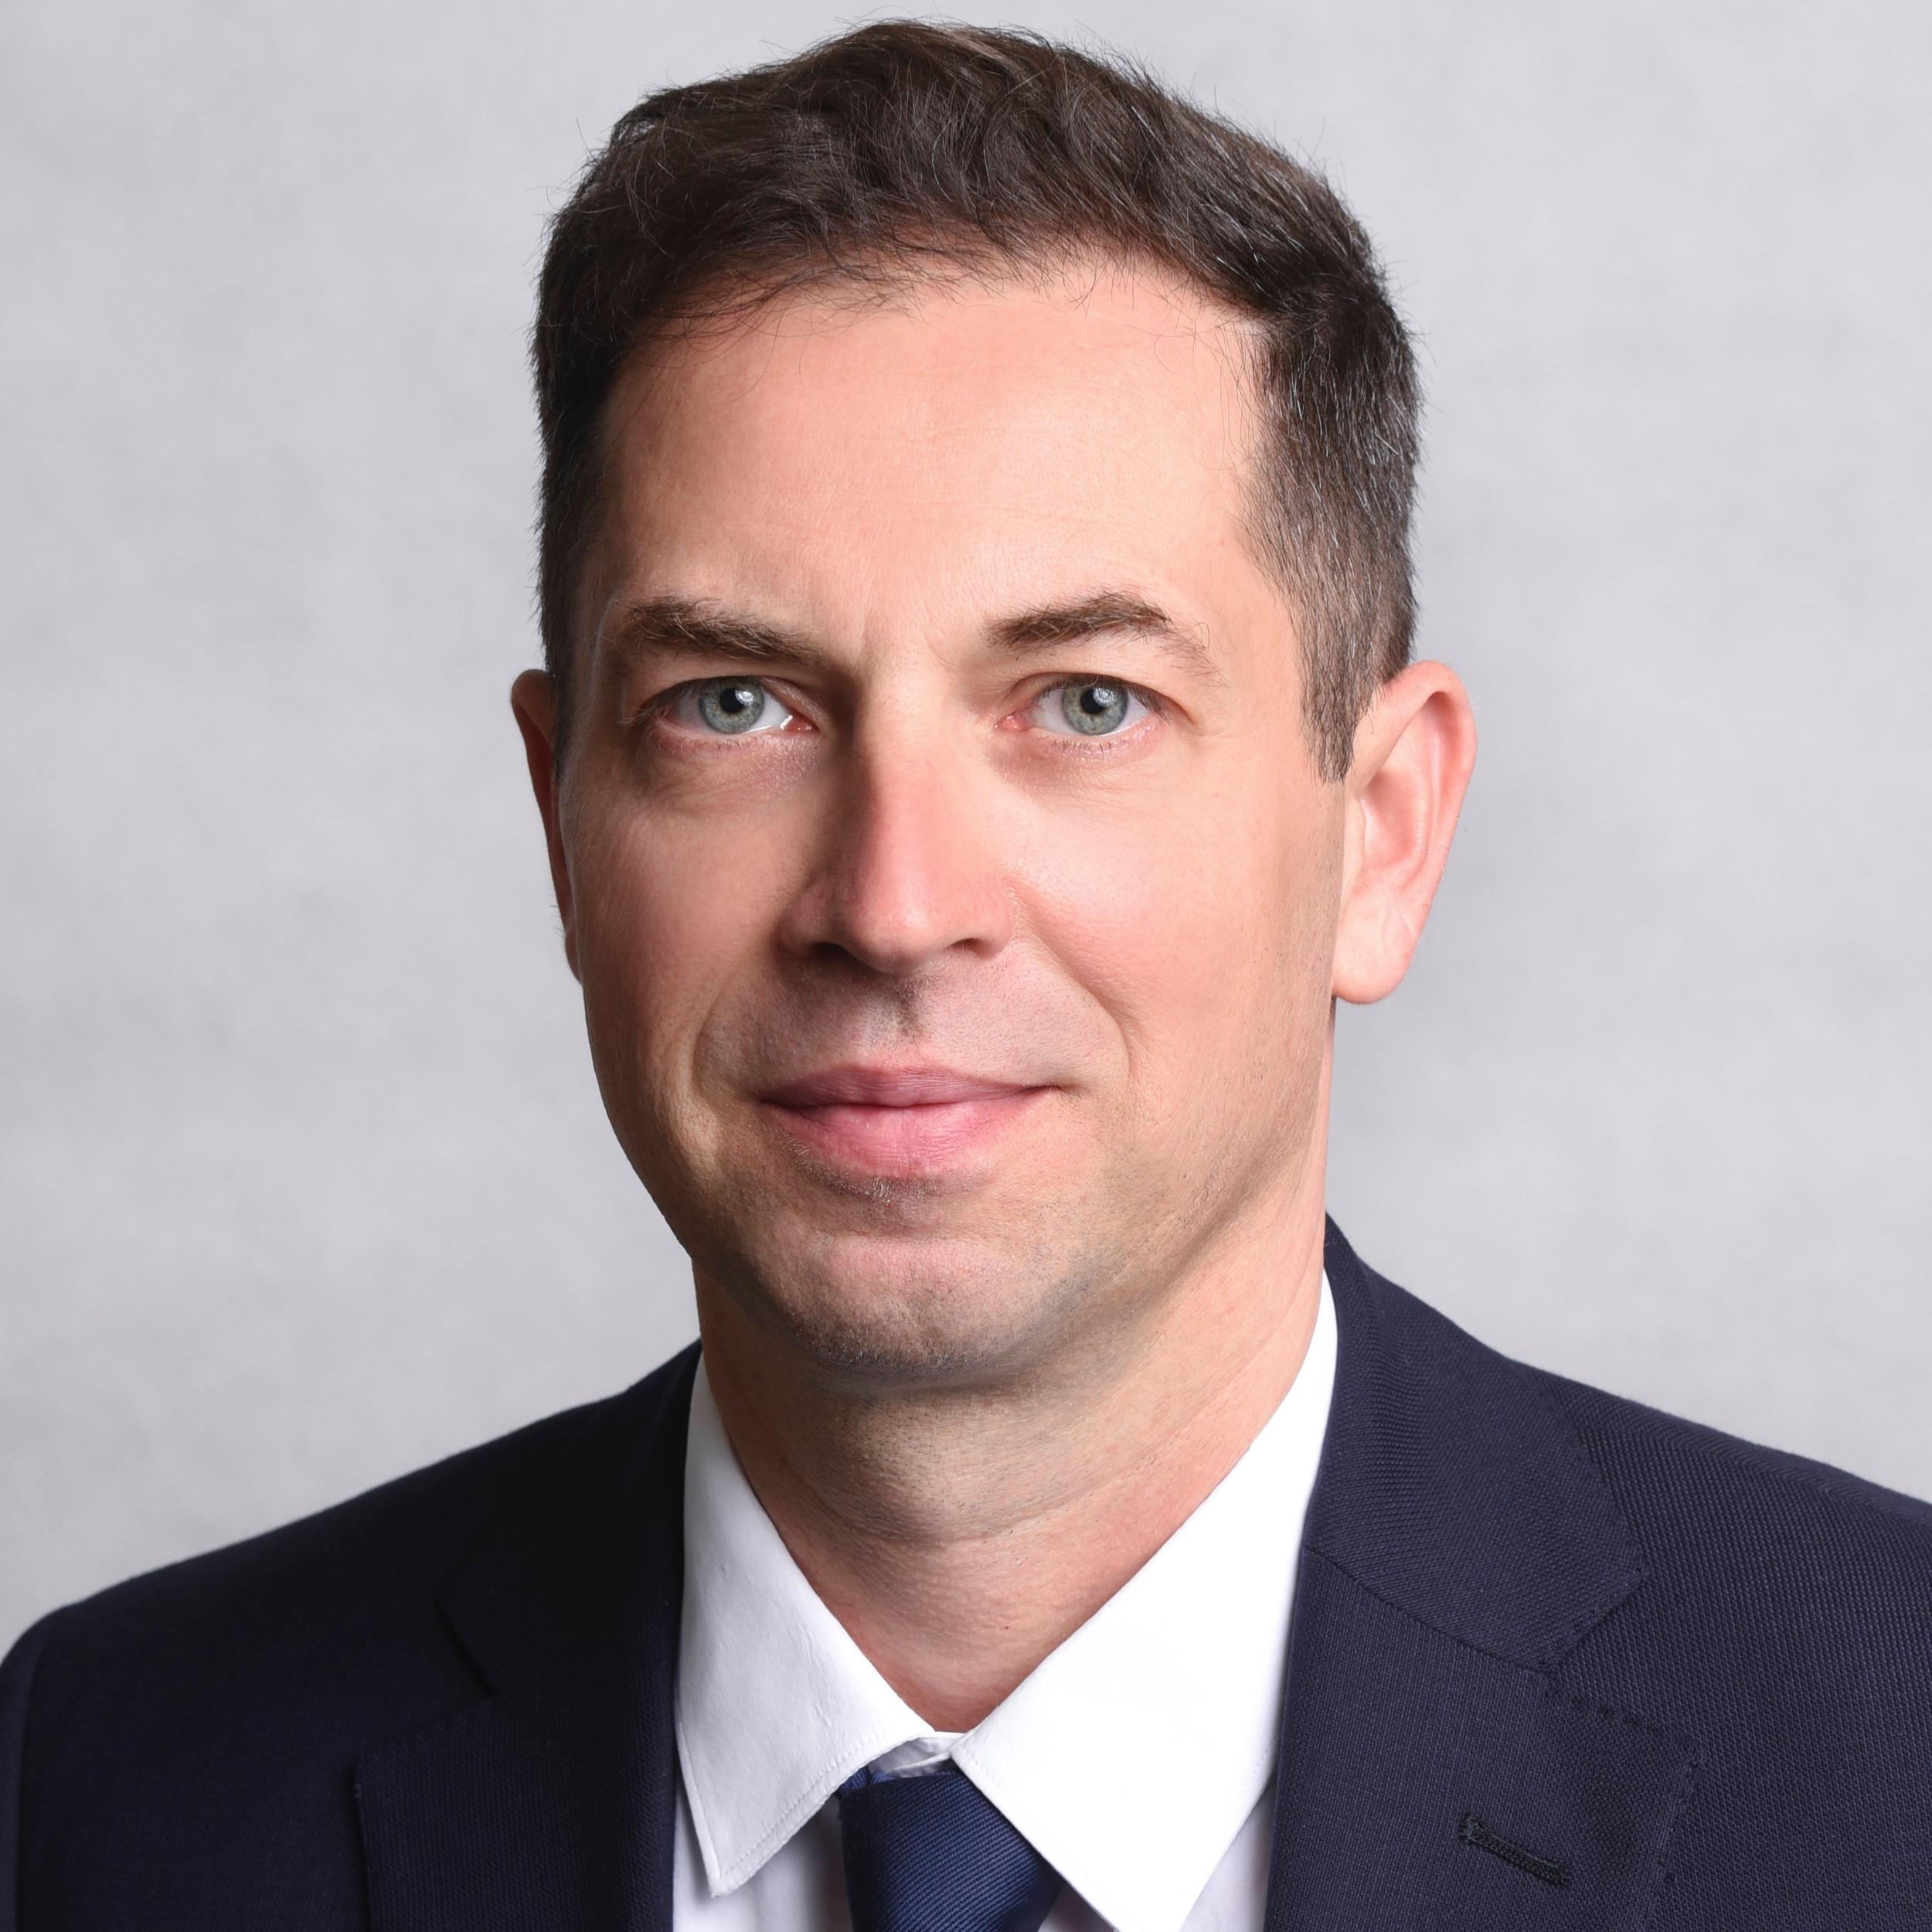 dr. Fehérváry Ákos  partner Baker McKenzie